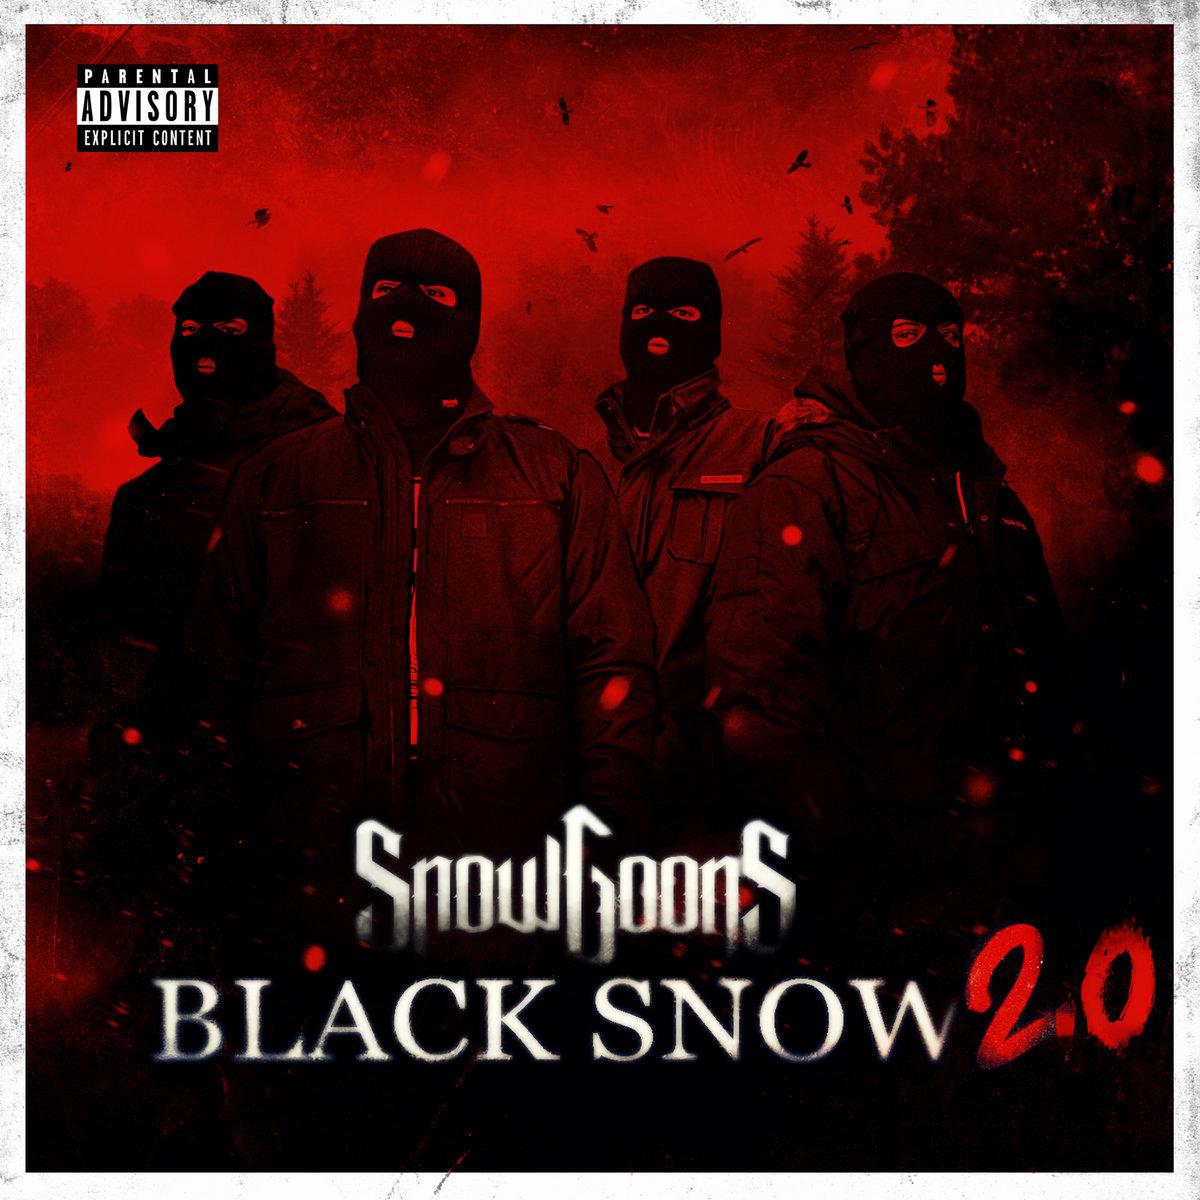 Black Snow 2 0 | Snowgoons